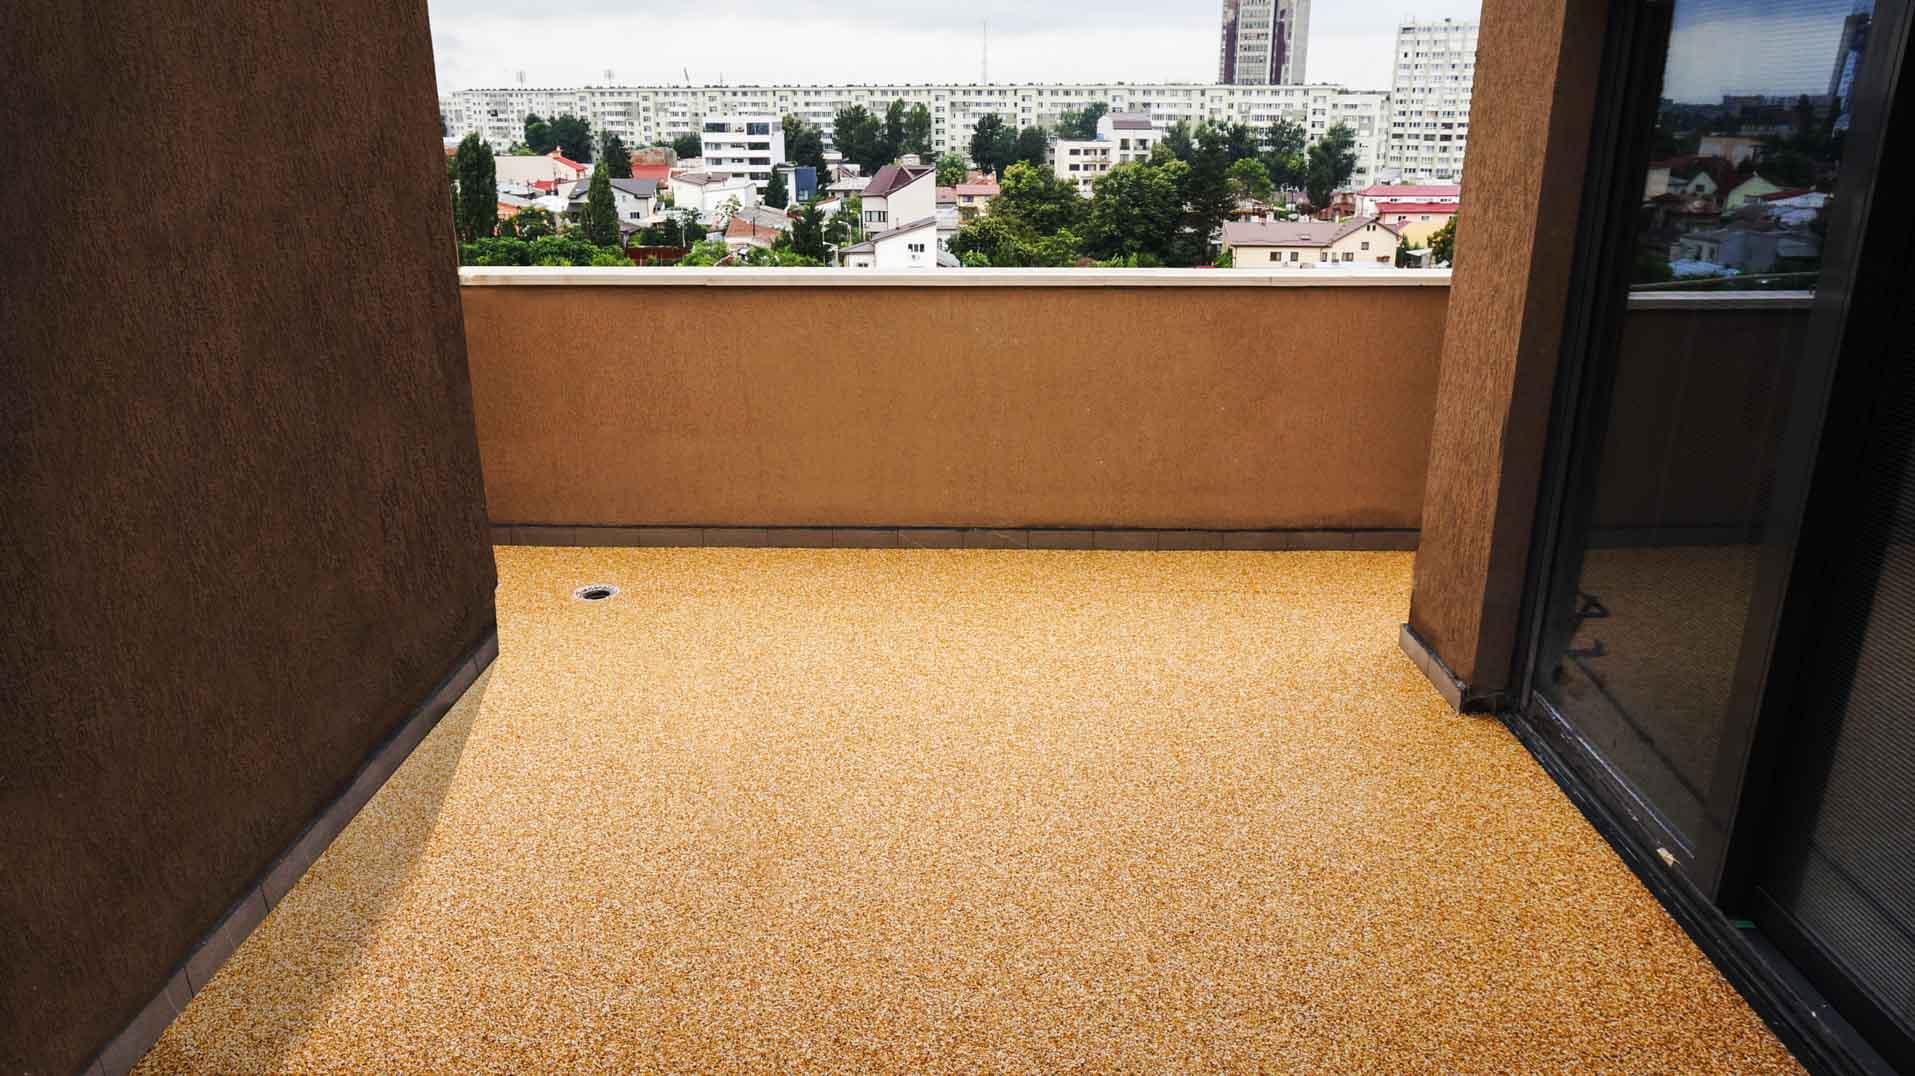 viarustik-floor-terrace